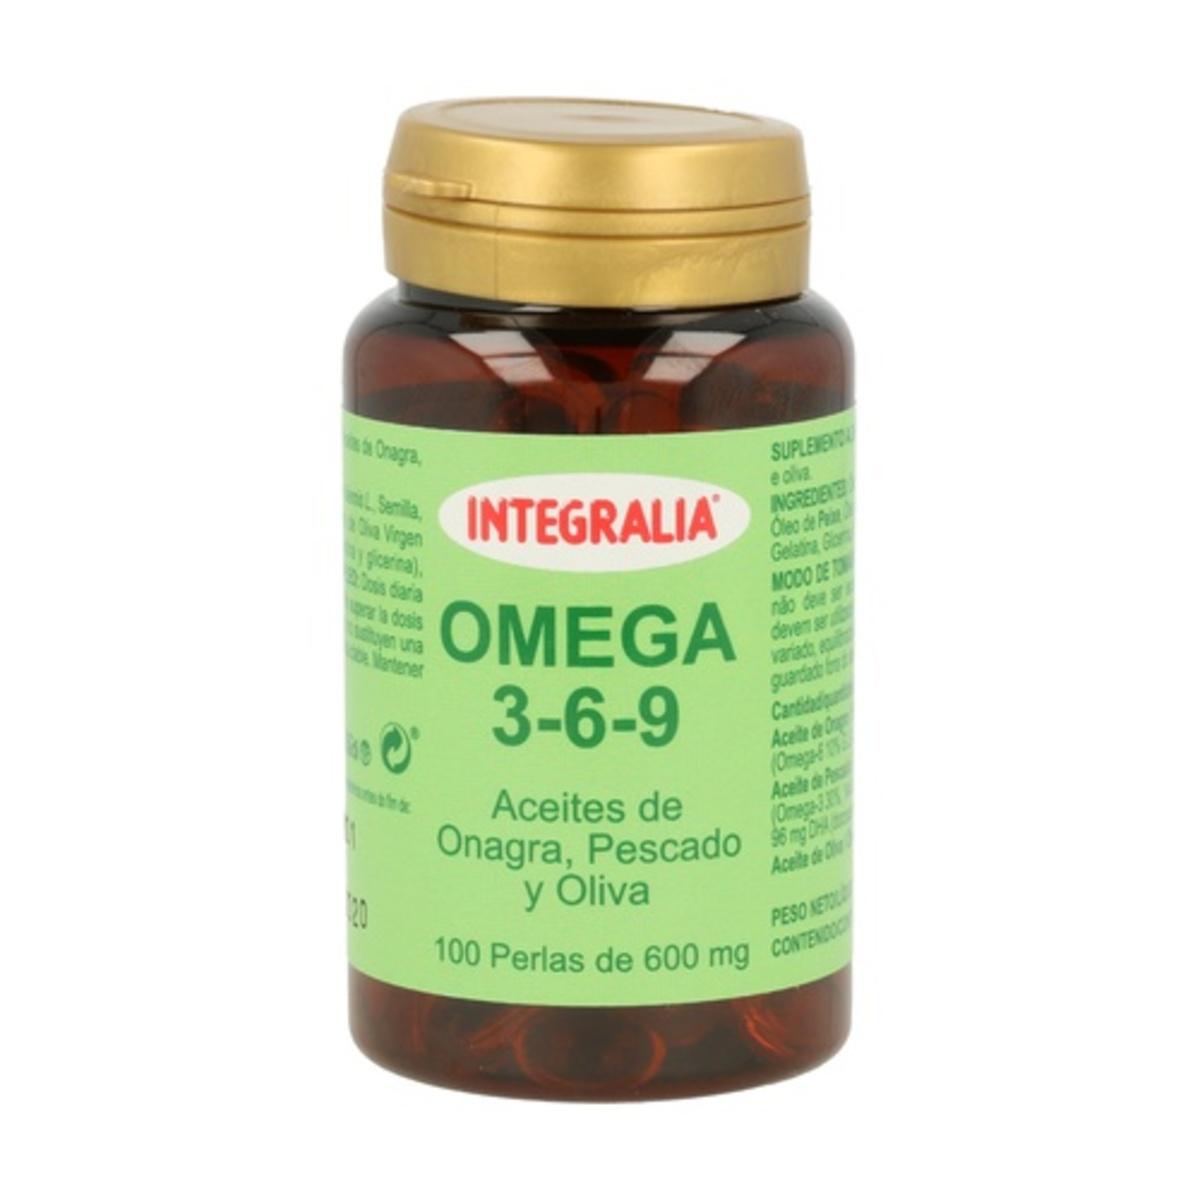 Omega 3-6-9 600mg 100 perlas. Integralia